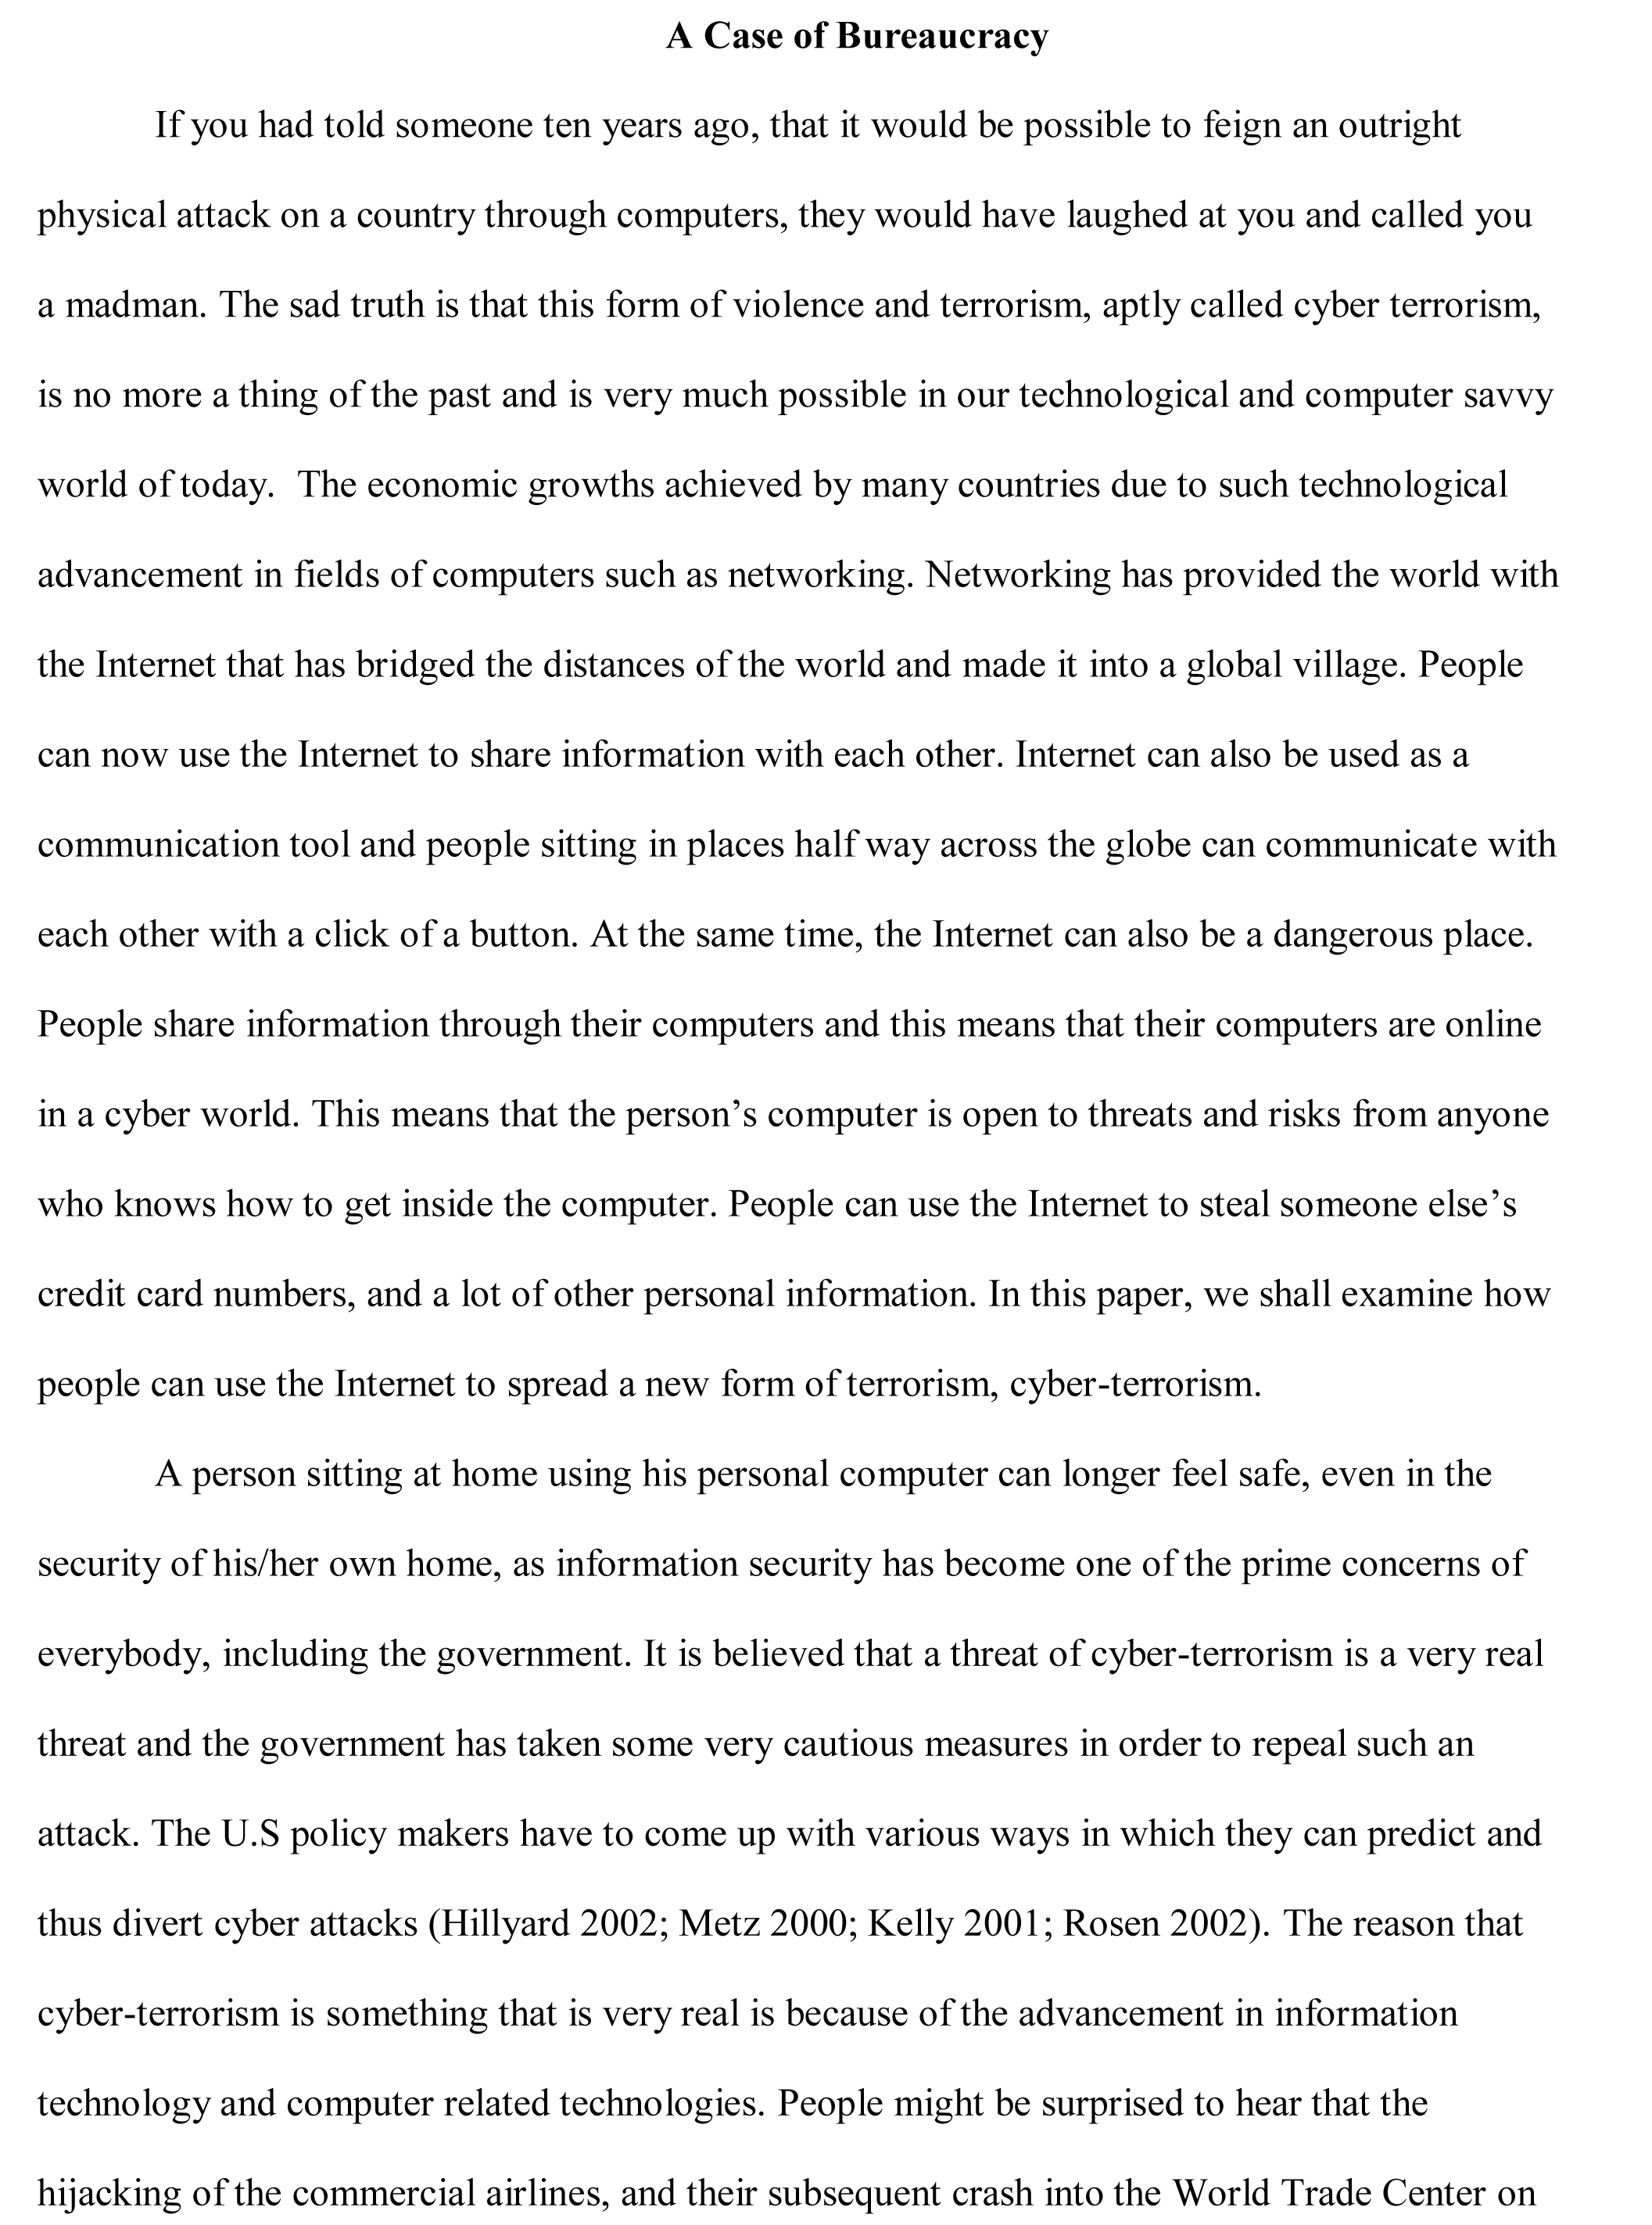 012 Essay Example Lemon Clot Unusual Reddit Bbc Full